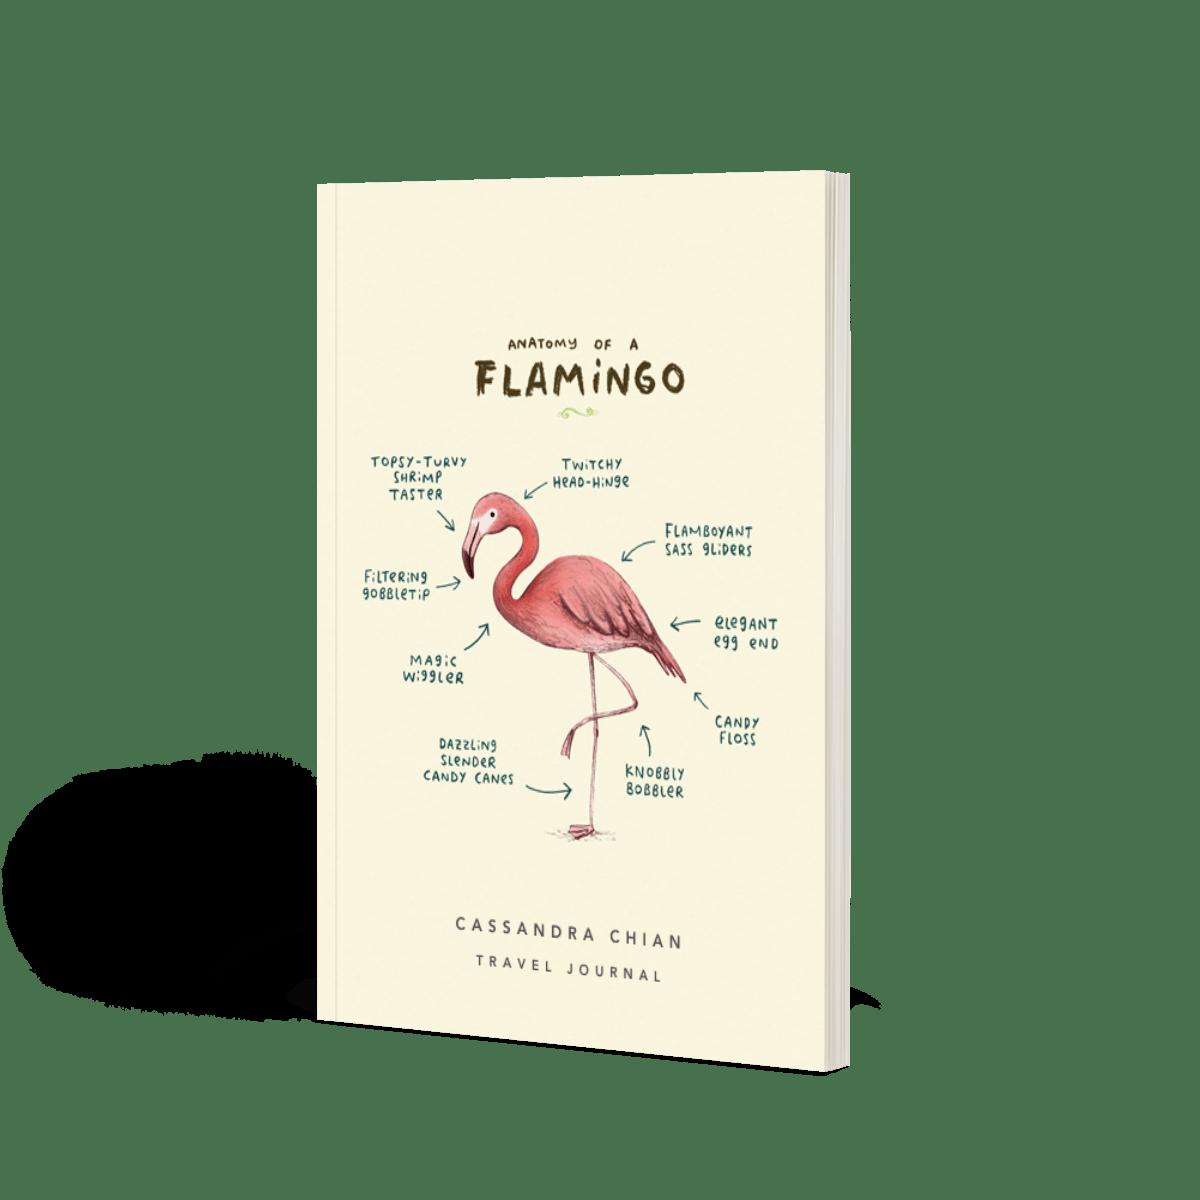 Https%3a%2f%2fwww.papier.com%2fproduct image%2f14634%2f6%2fanatomy of a flamingo 3898 avant 1542811929.png?ixlib=rb 1.1